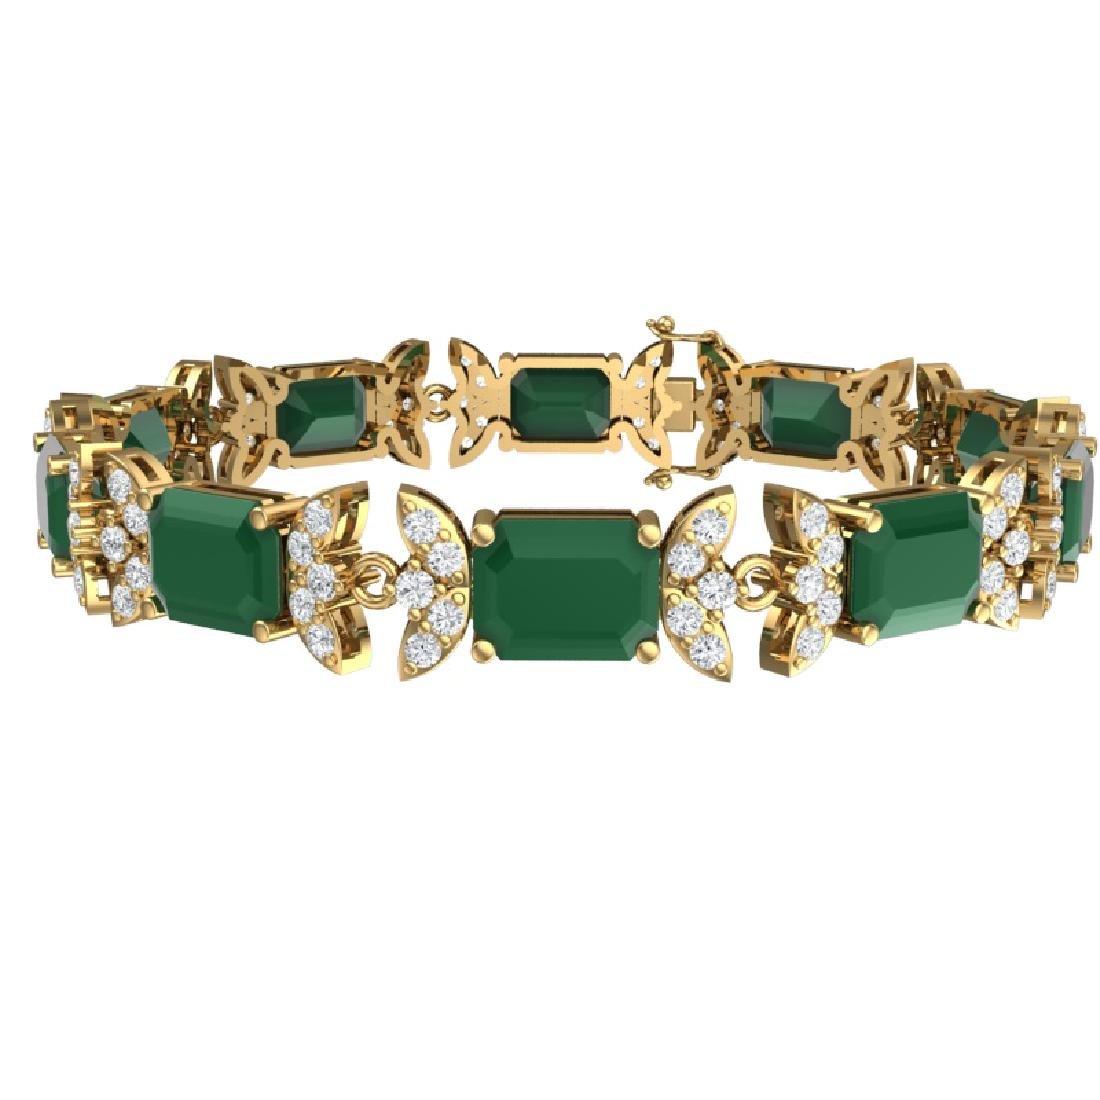 38.13 CTW Royalty Emerald & VS Diamond Bracelet 18K - 3